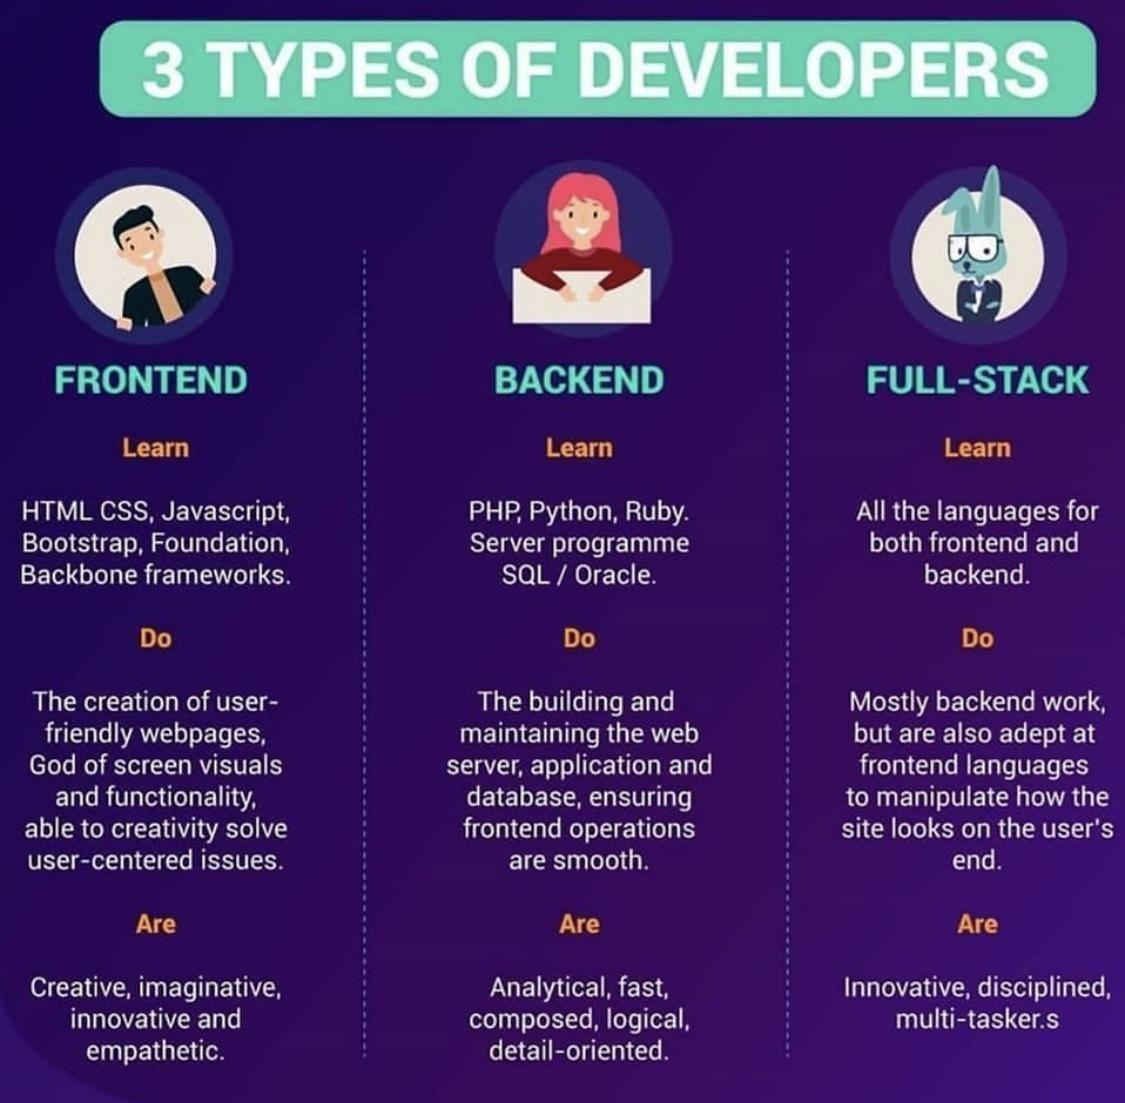 3 Types of Developers - Frontend, Backend and Full-Stack.  #WebDev #WebsiteDevelopment #WebDesign #WebsiteDesign #Design #AppDev #AppDevelopment #AppDesign<br>http://pic.twitter.com/aKXssPpwtI